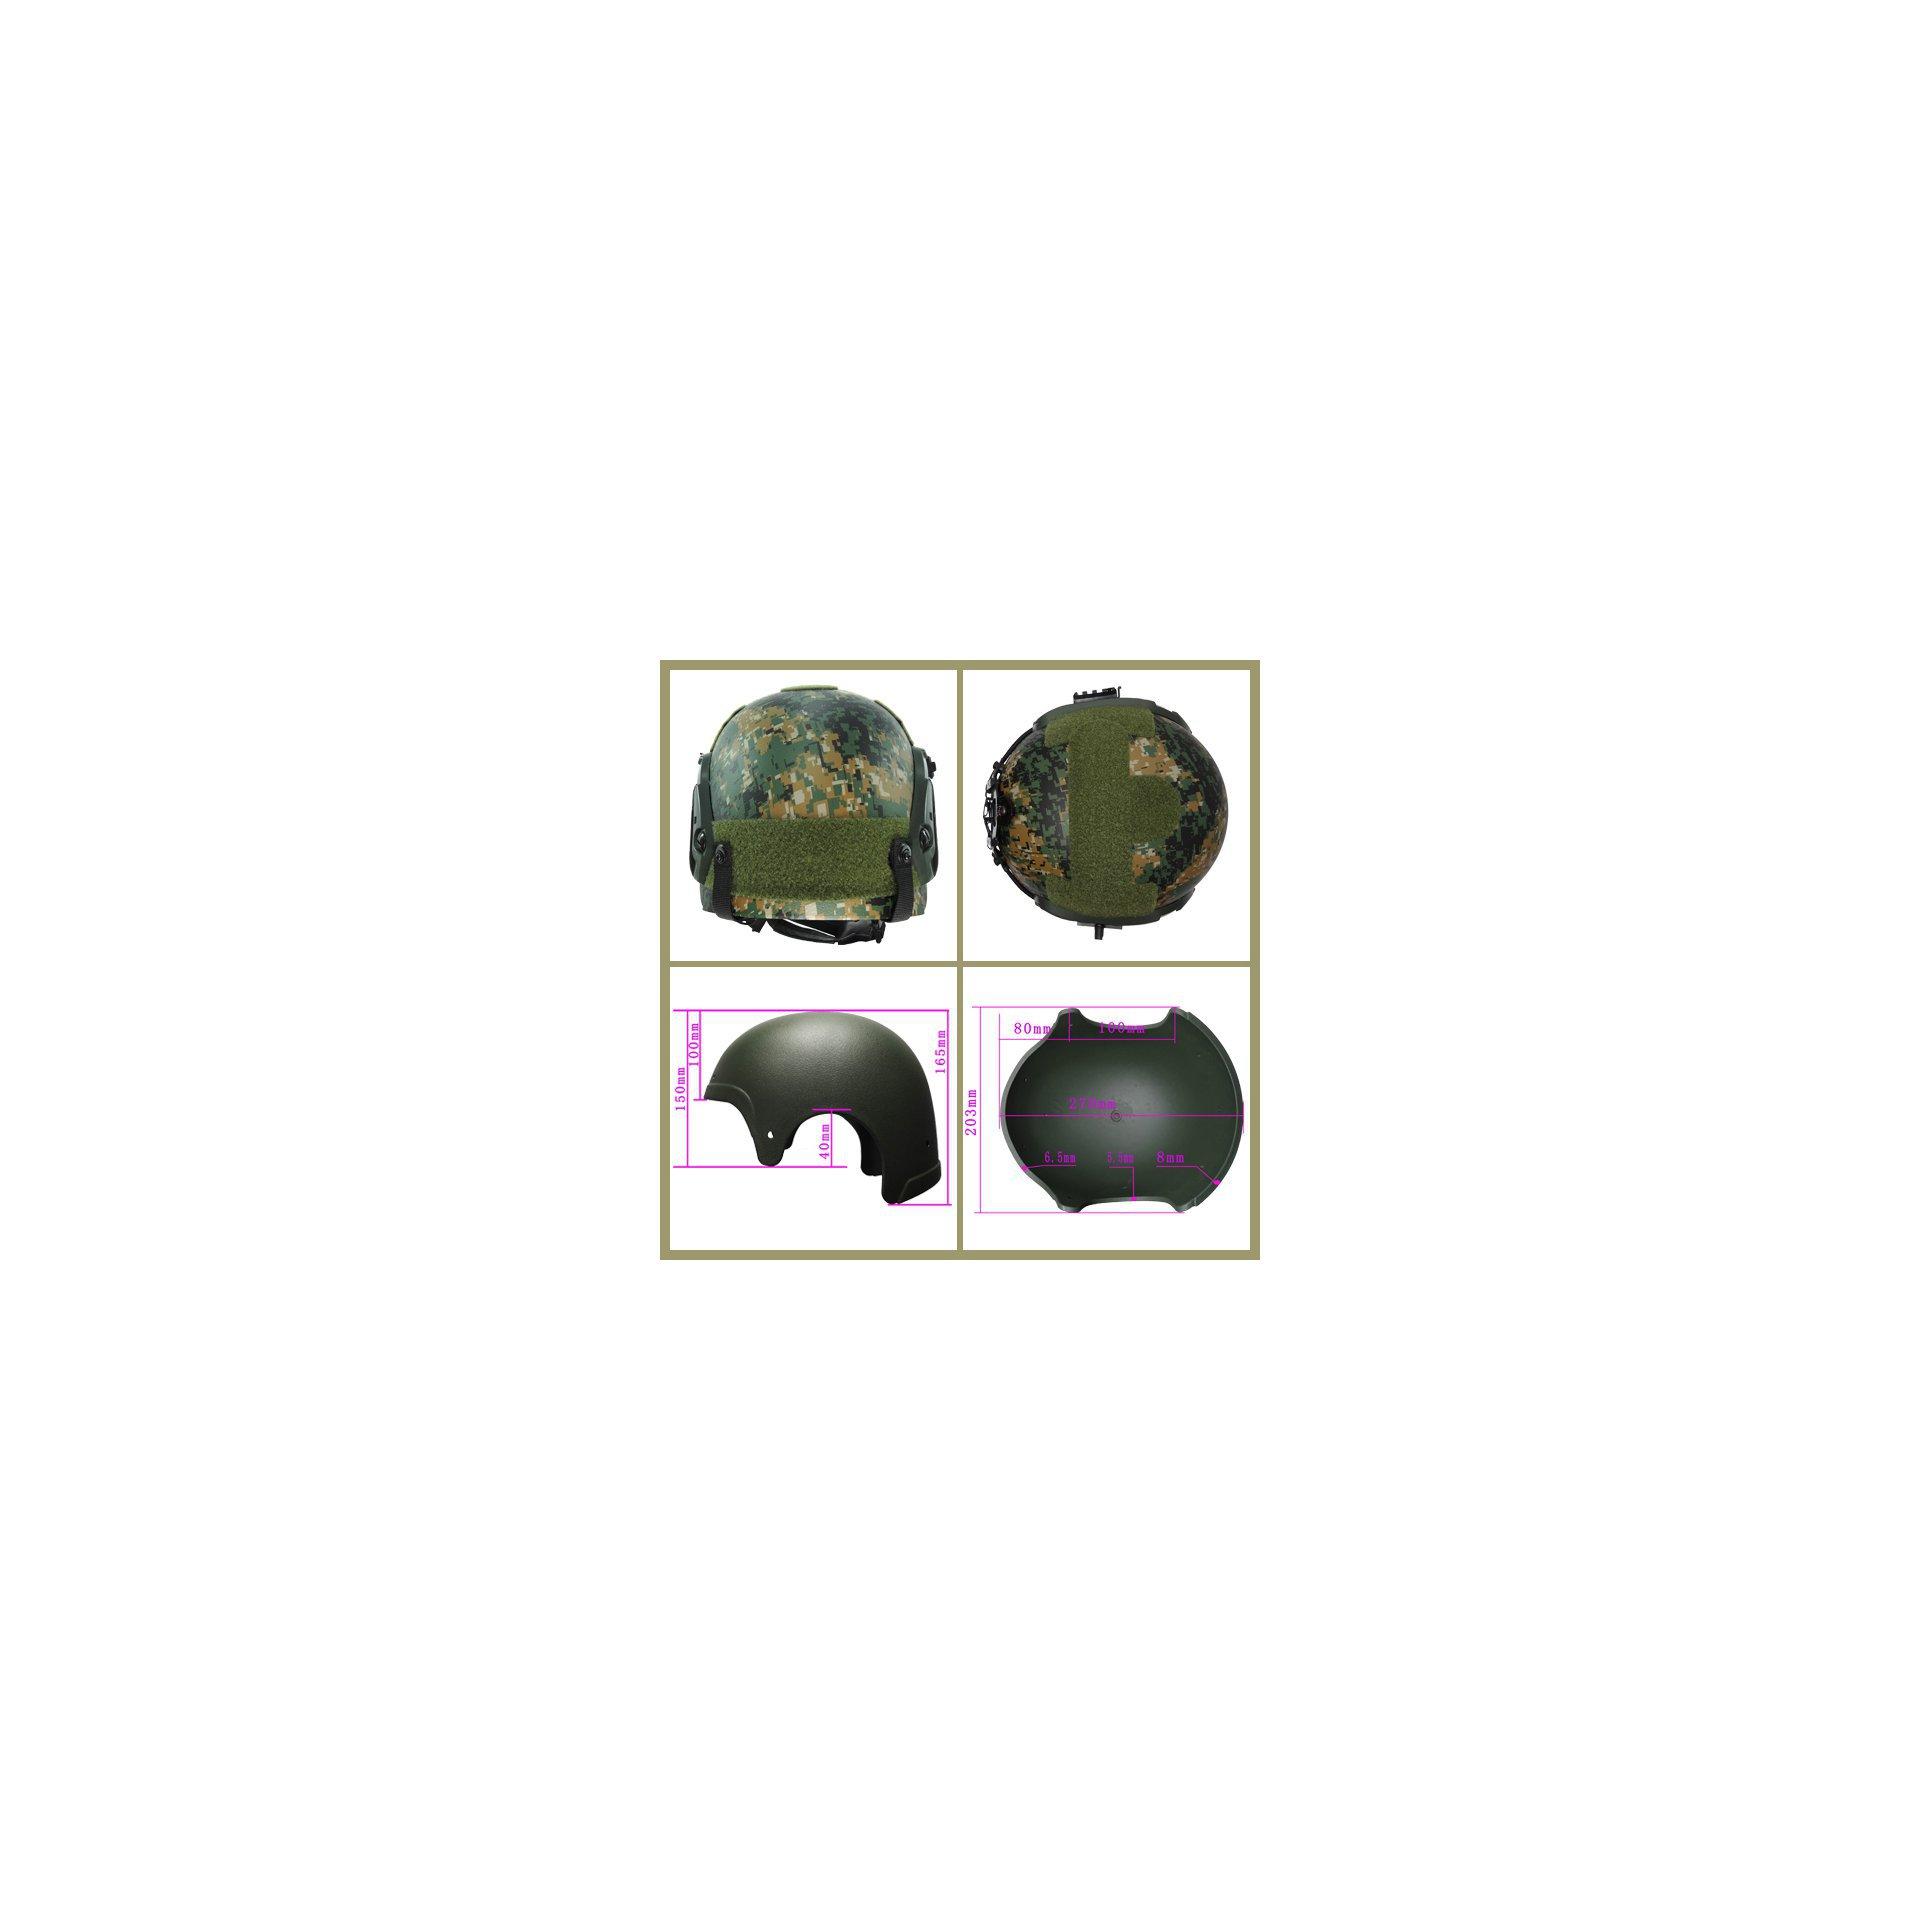 Capacete Tático Para Airsoft/paintball Mod Ibh X Woodland Digital